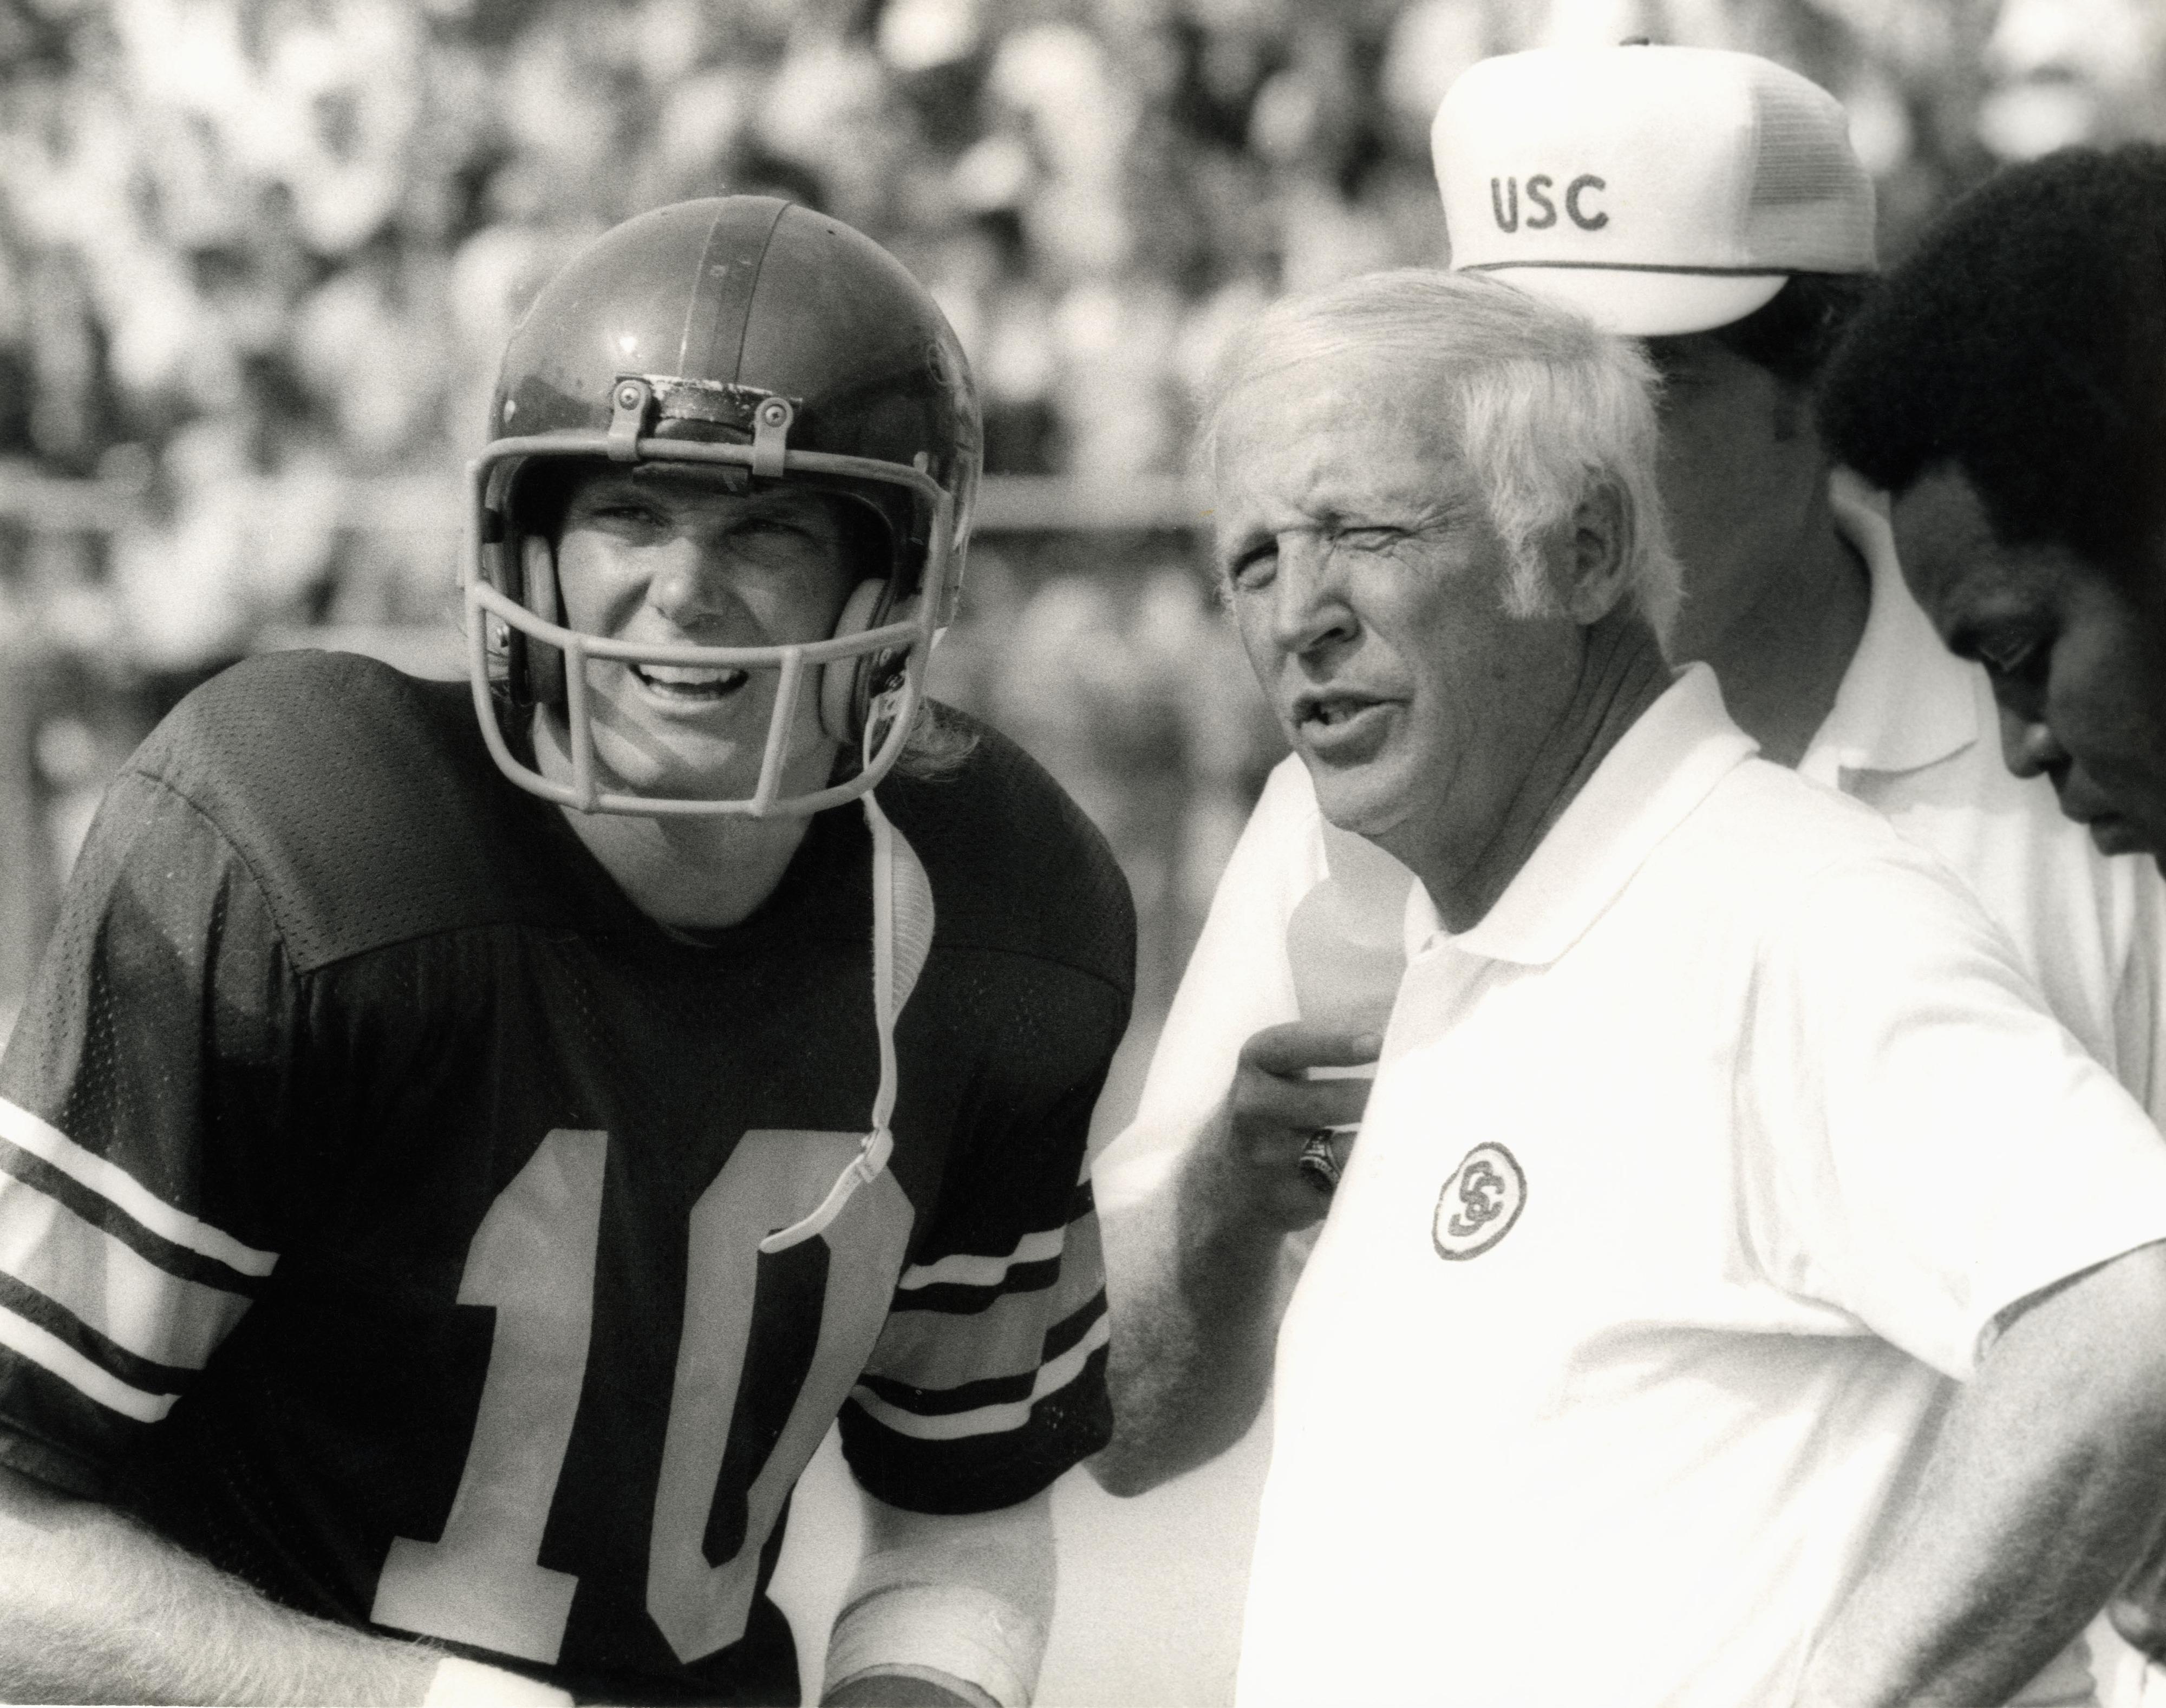 1984 would be John McKay's last season as head coach of the Buccaneers.